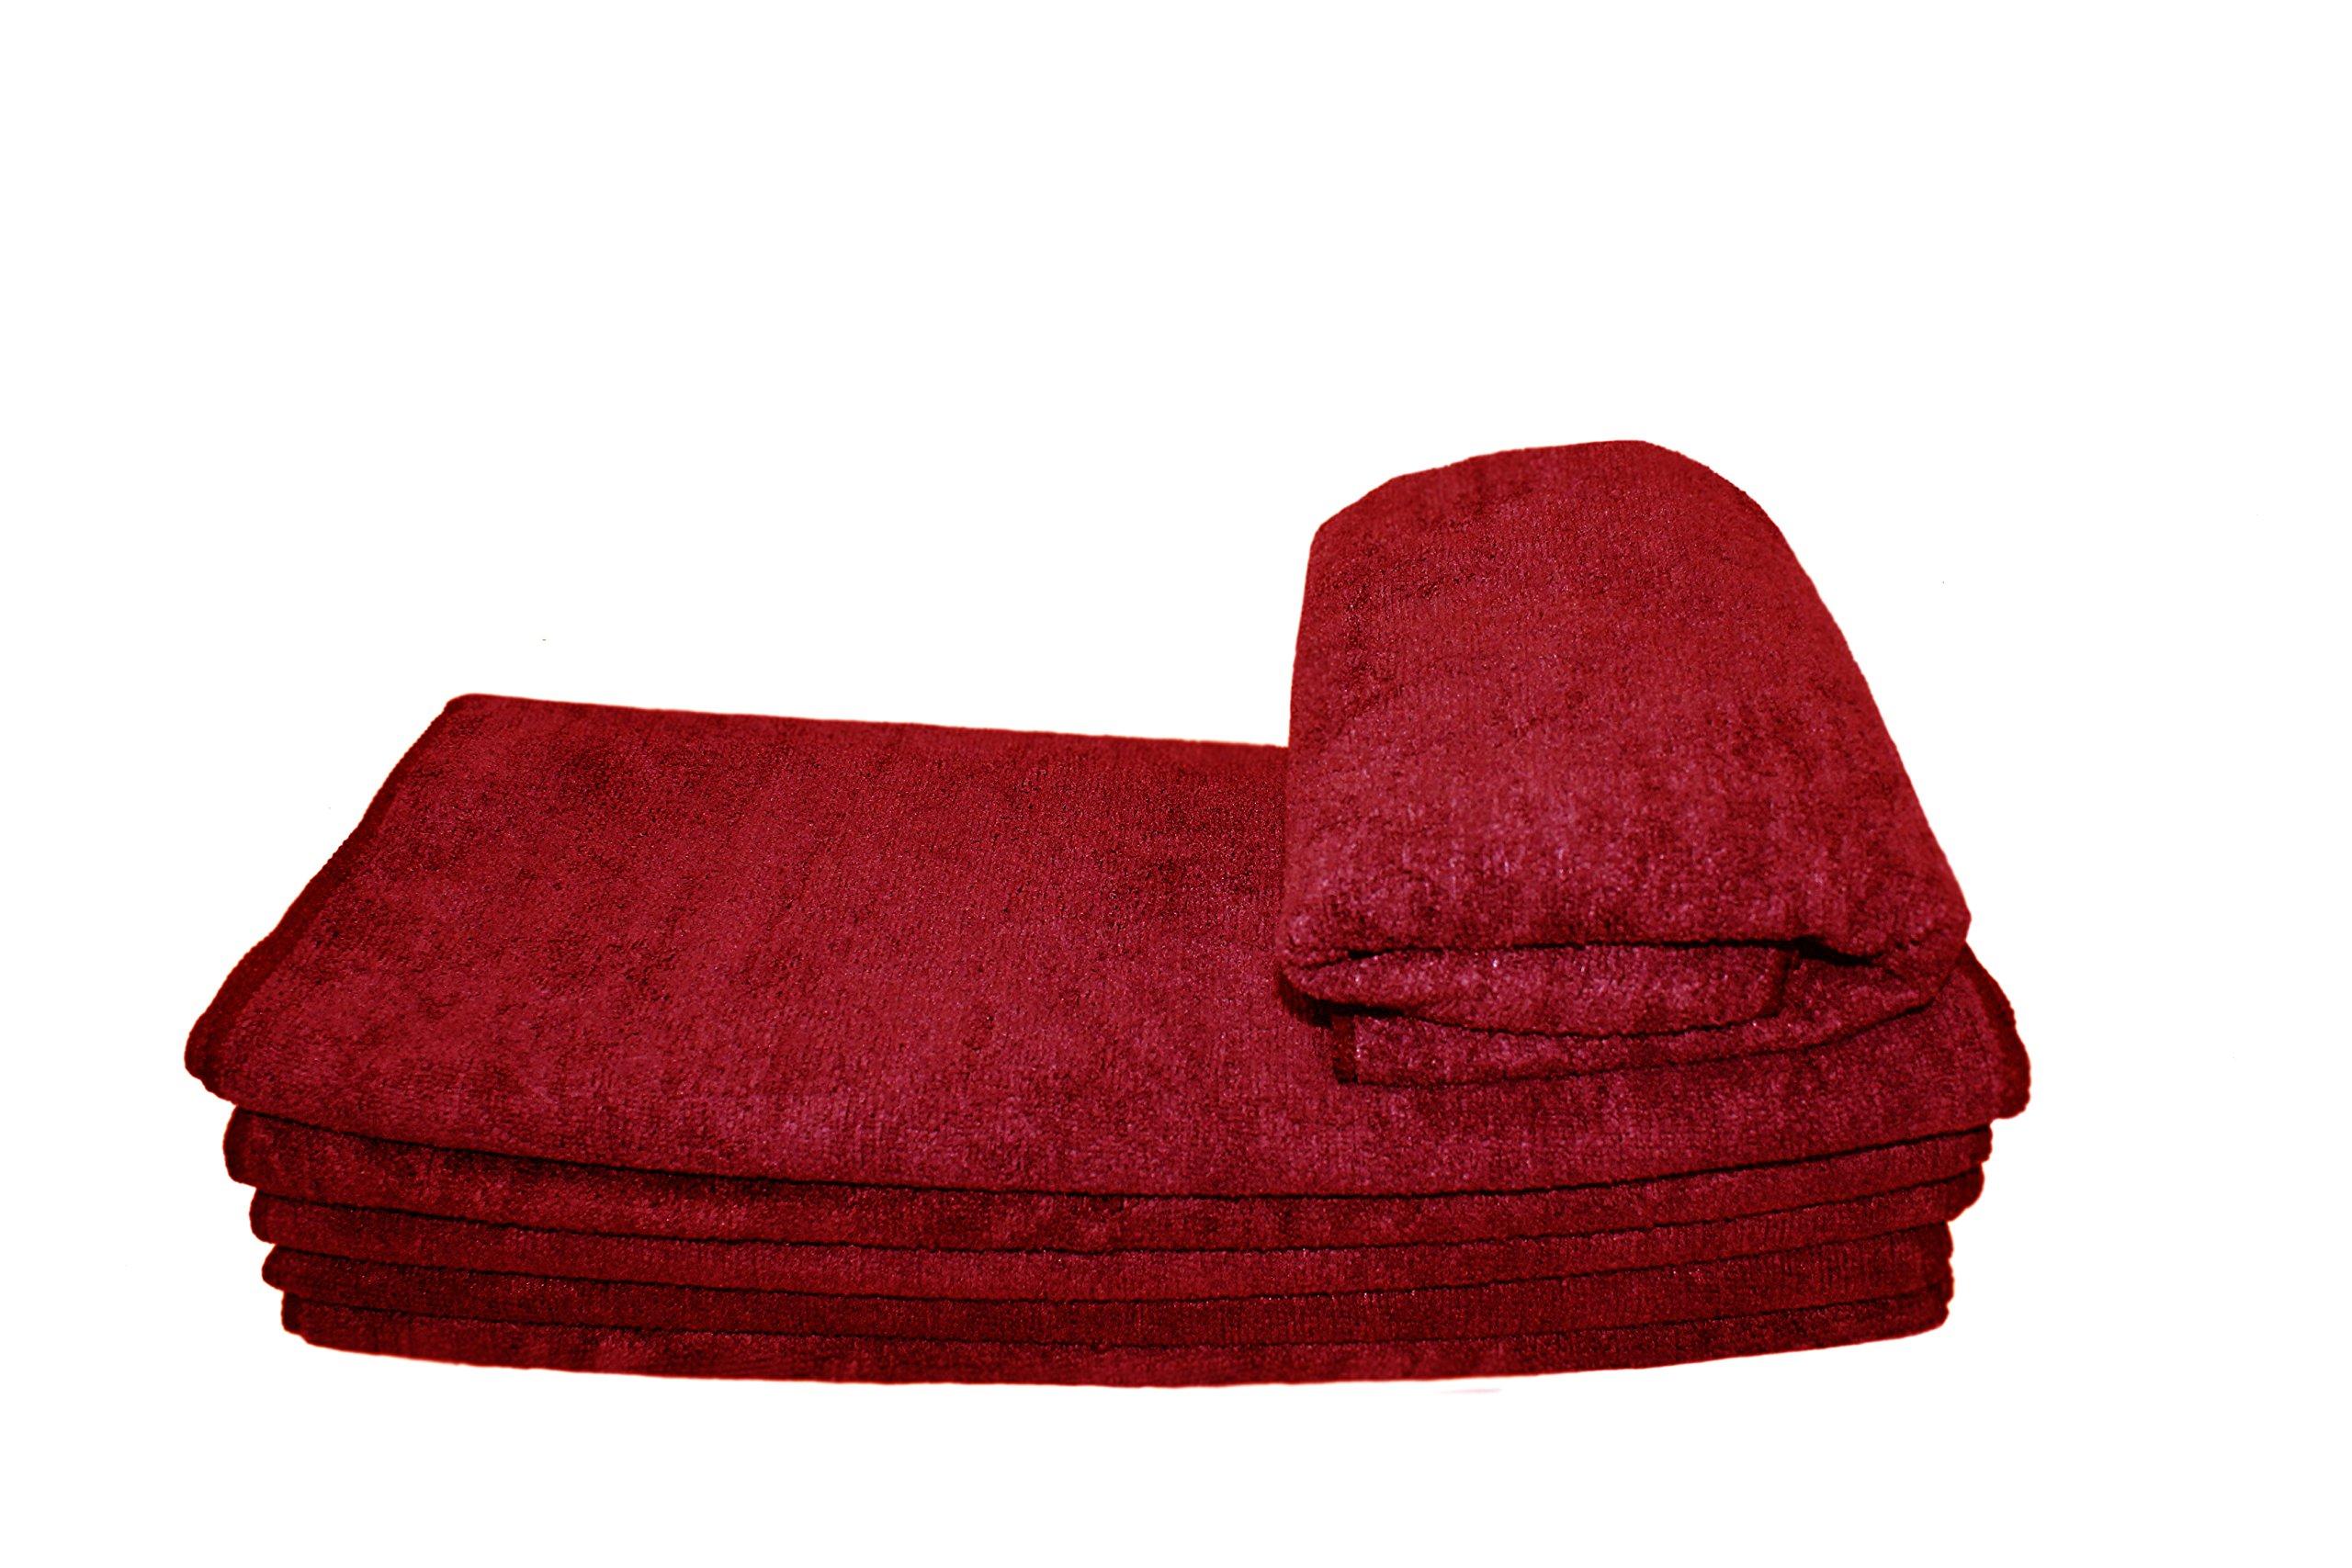 6 DOZEN 72pcs Premium Microfiber Towel 16'' X 27'' - Red